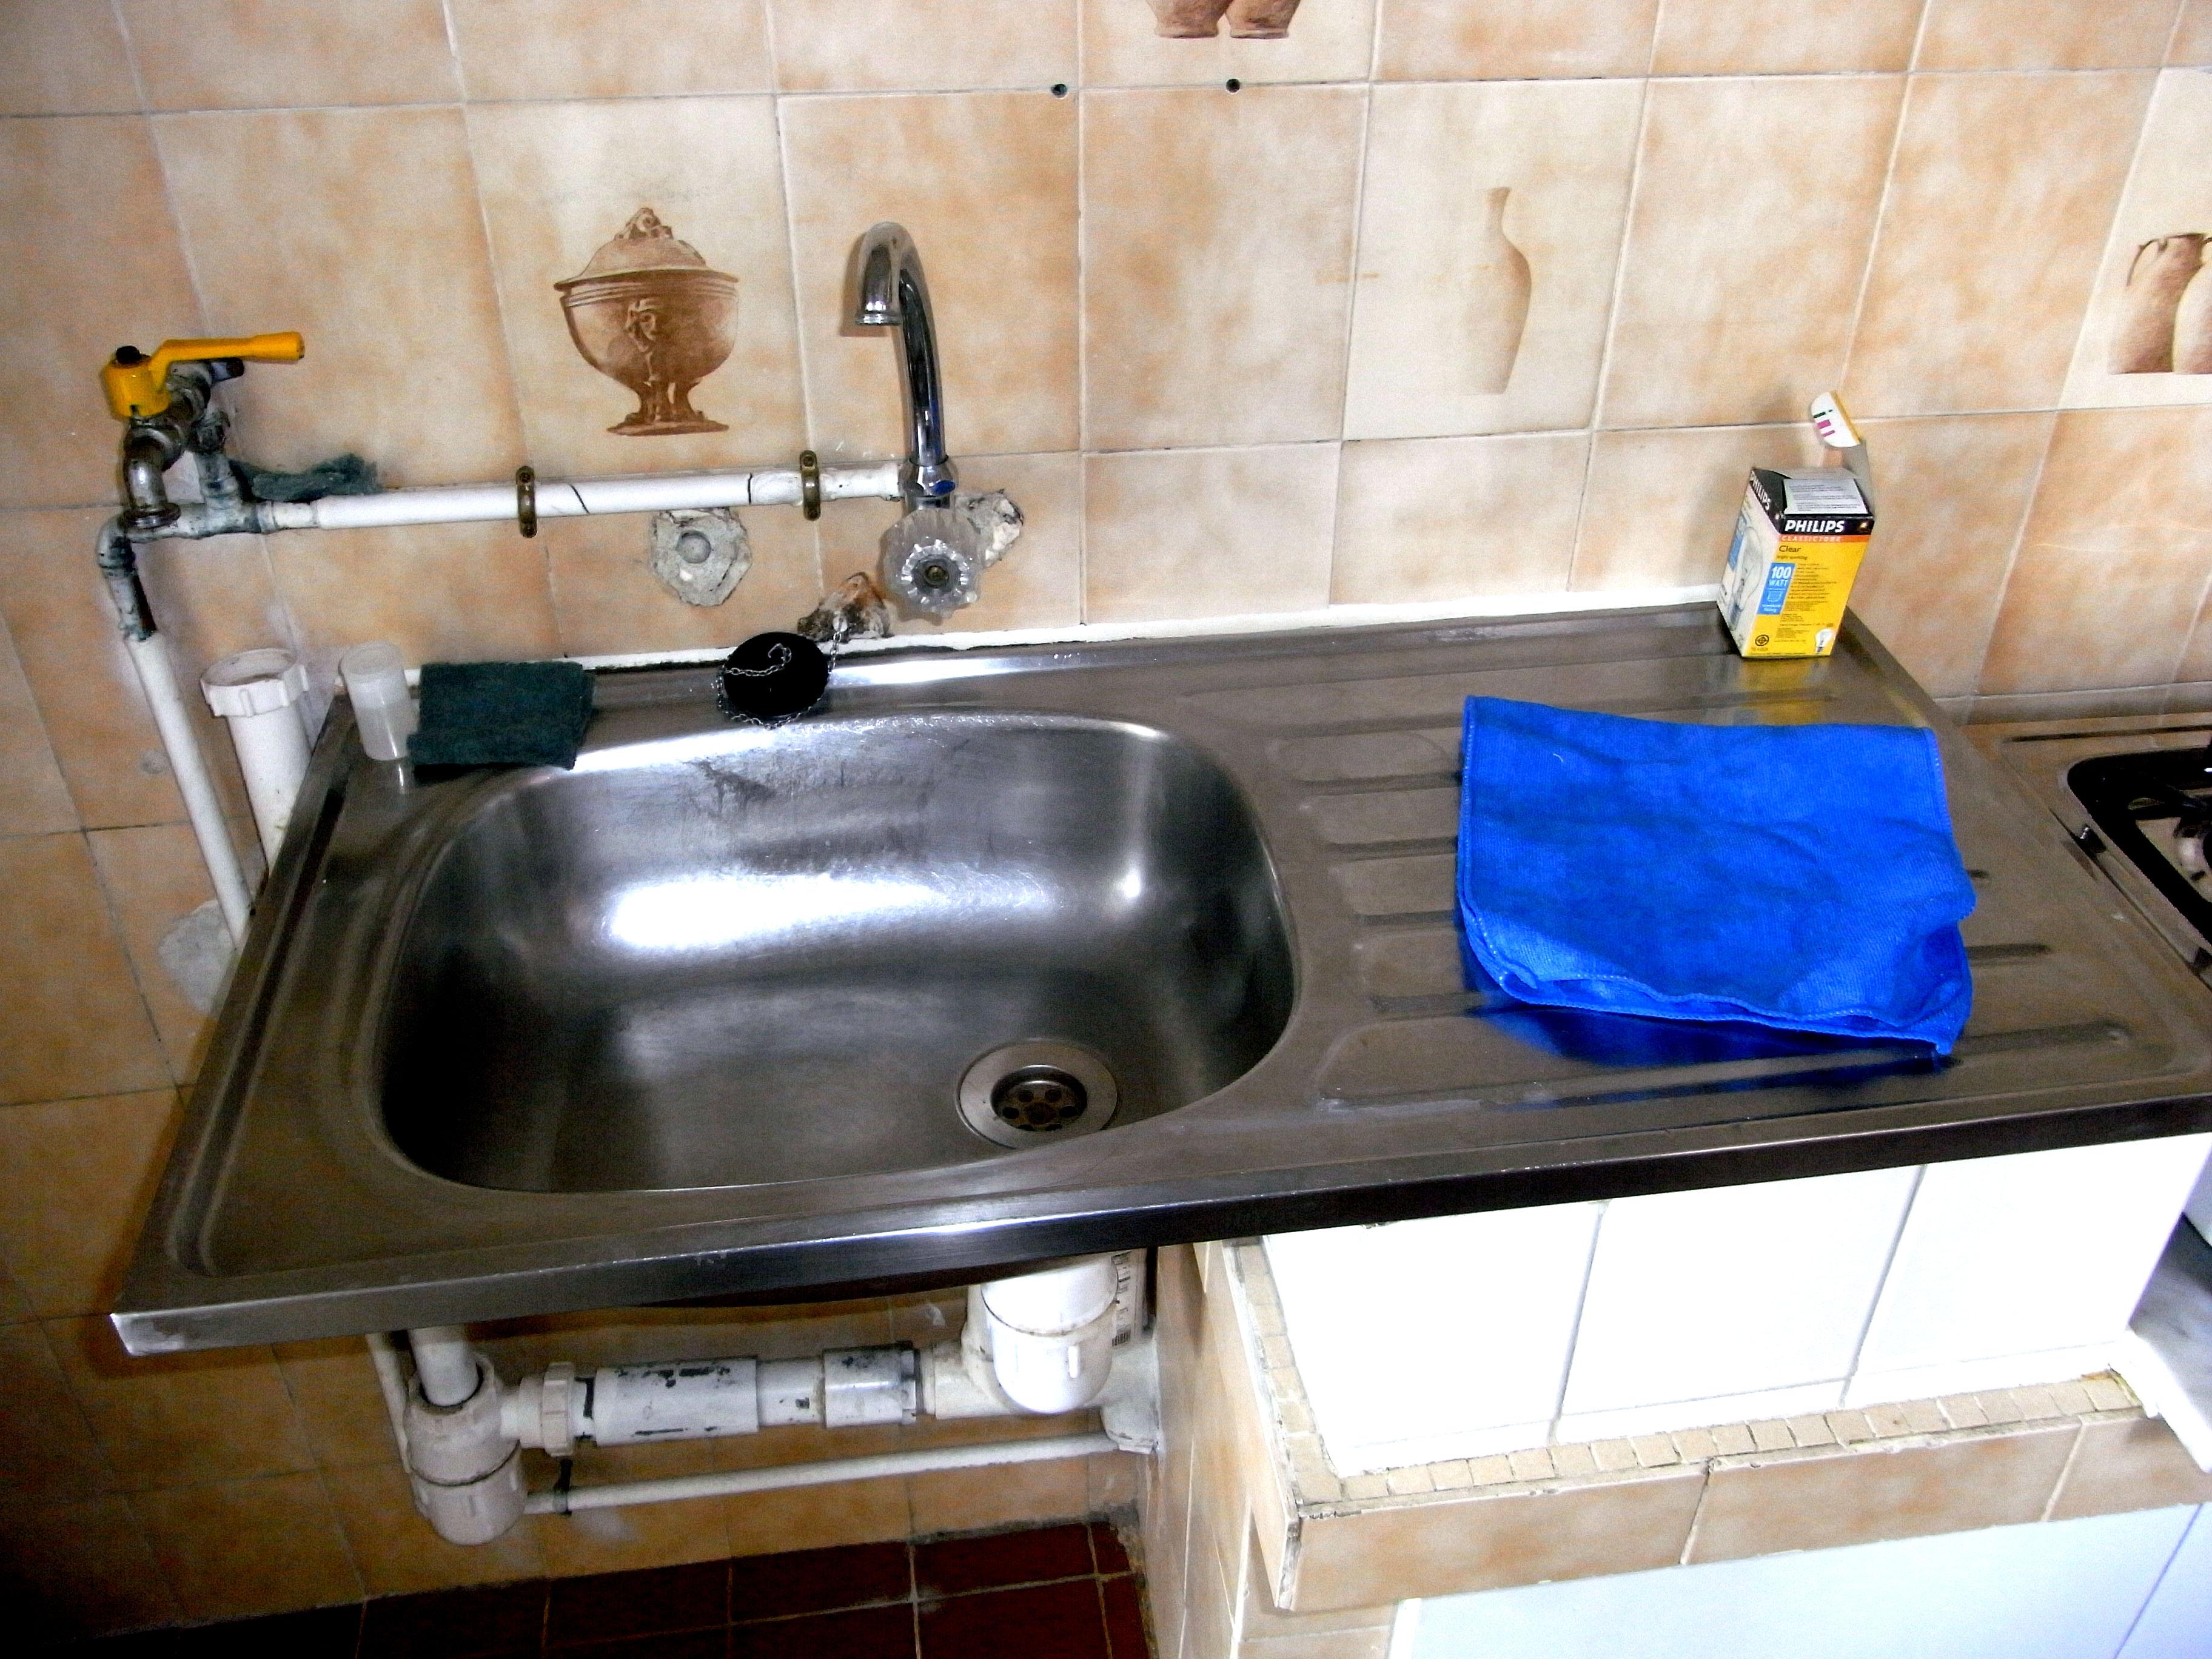 Is Kitchen Sink Water Safe To Drink